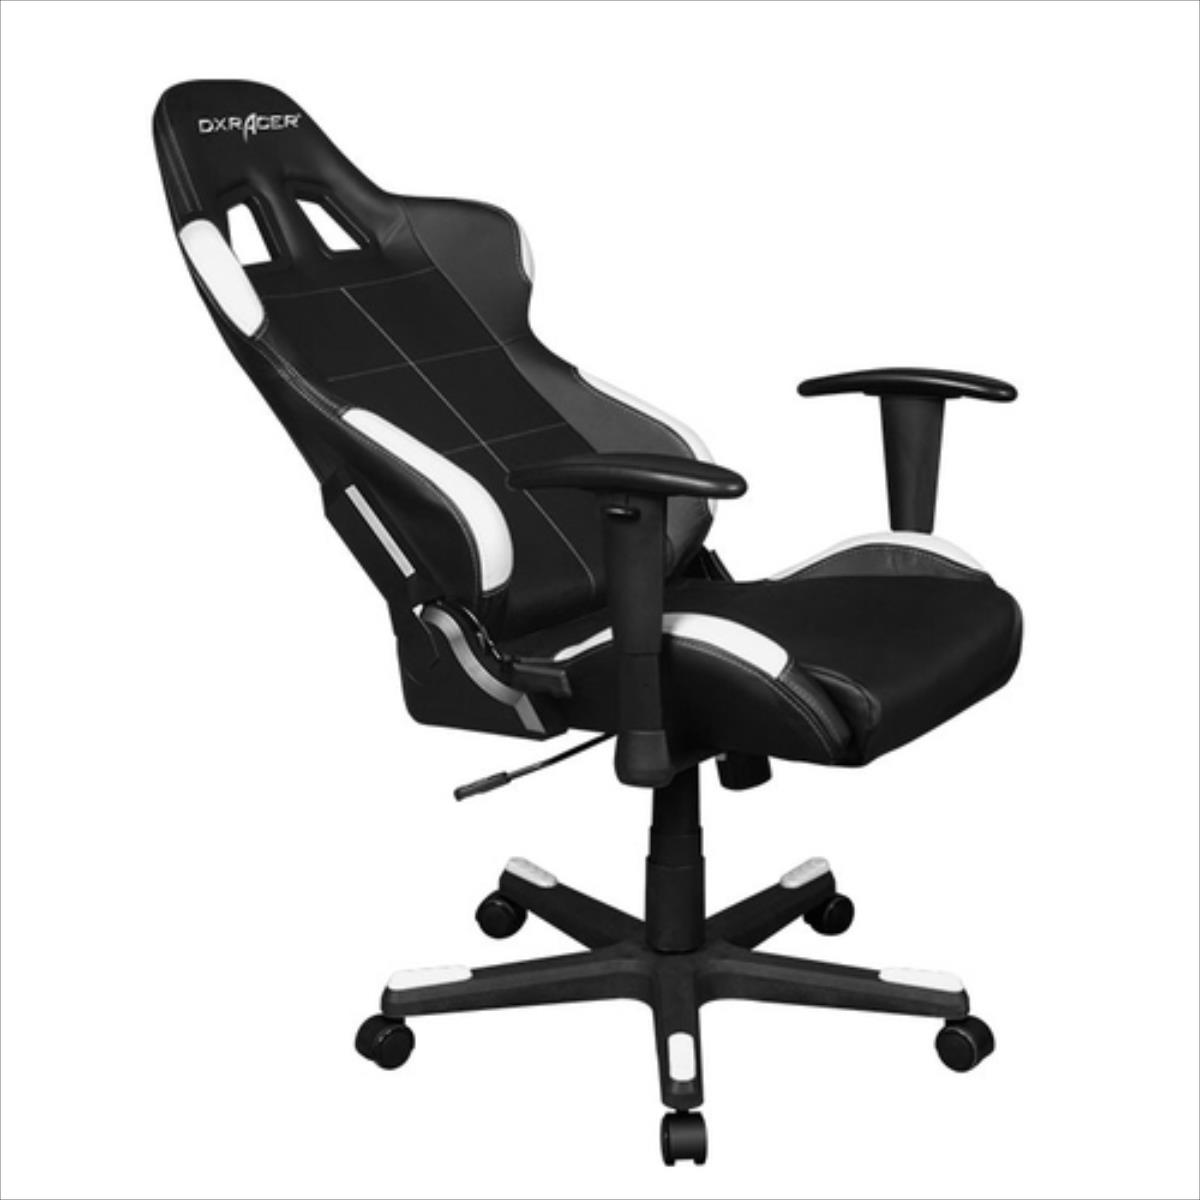 DXRacer Formula OH/FD99/NW Gaming black/white datorkrēsls, spēļukrēsls